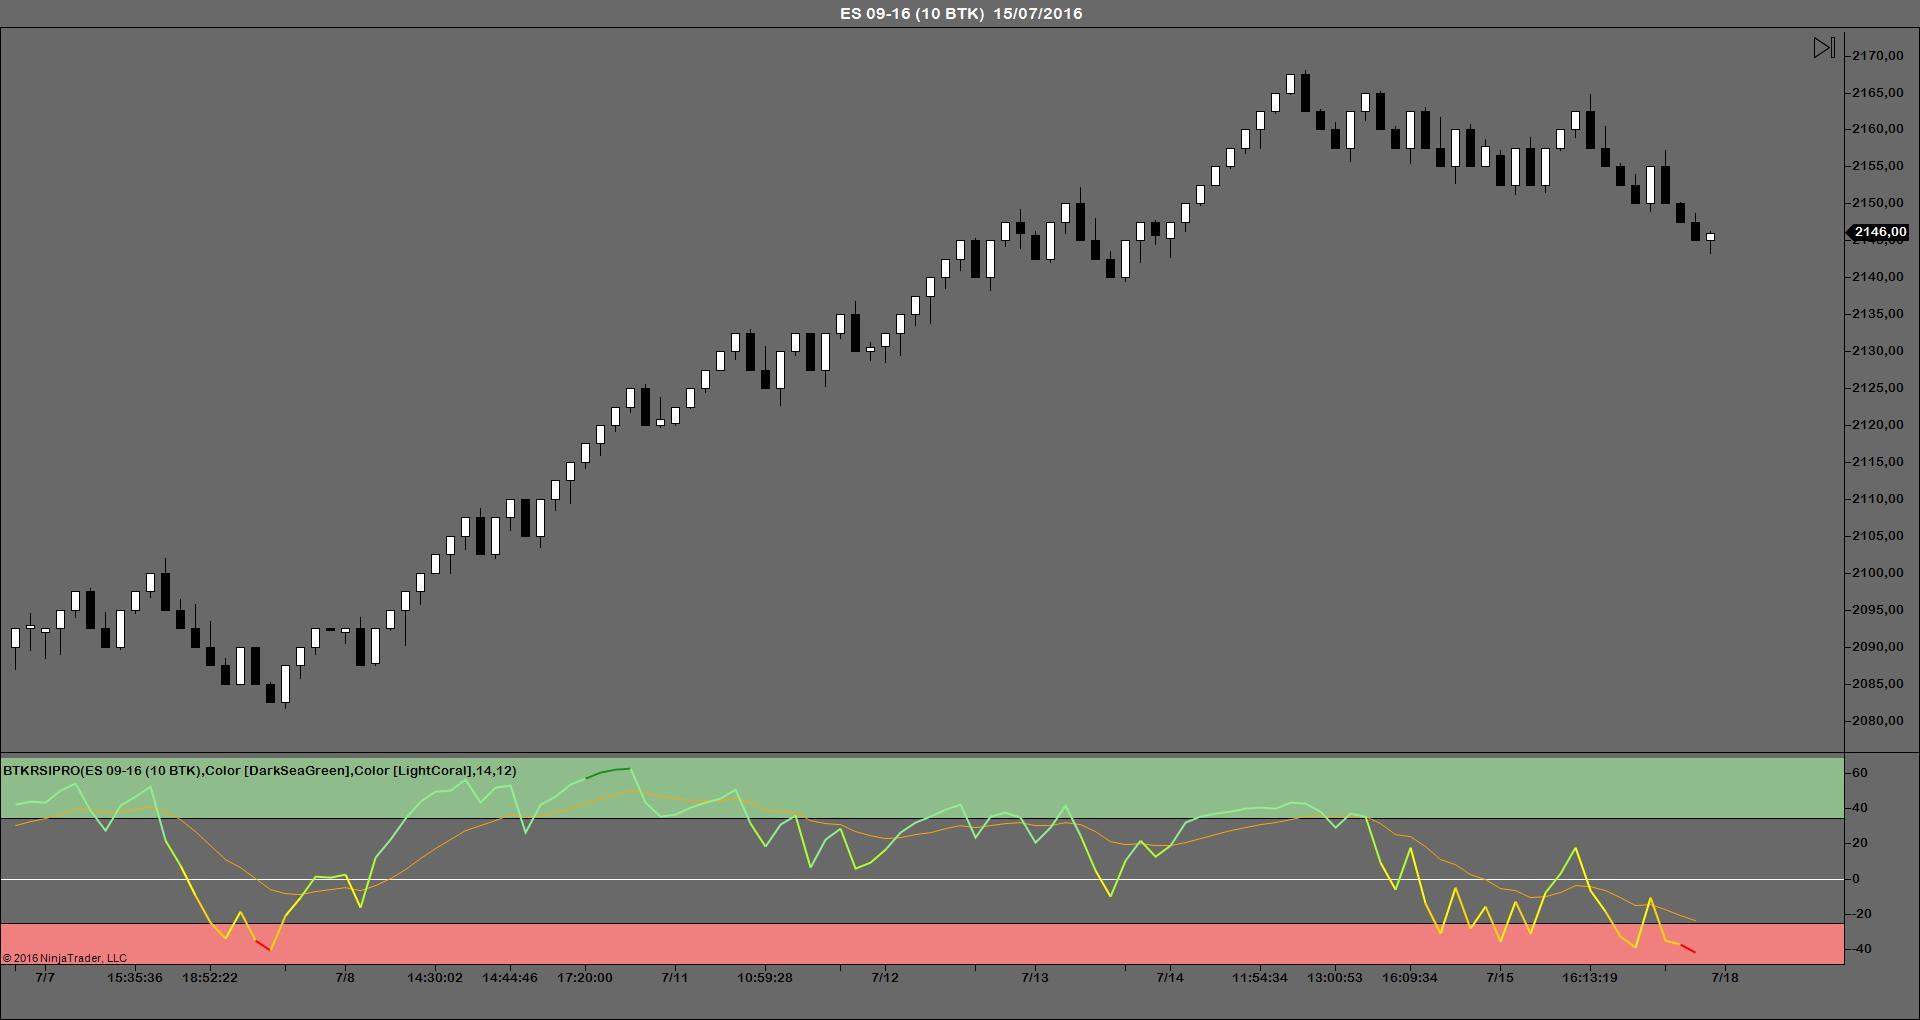 BTKRSIPRO indicador trading